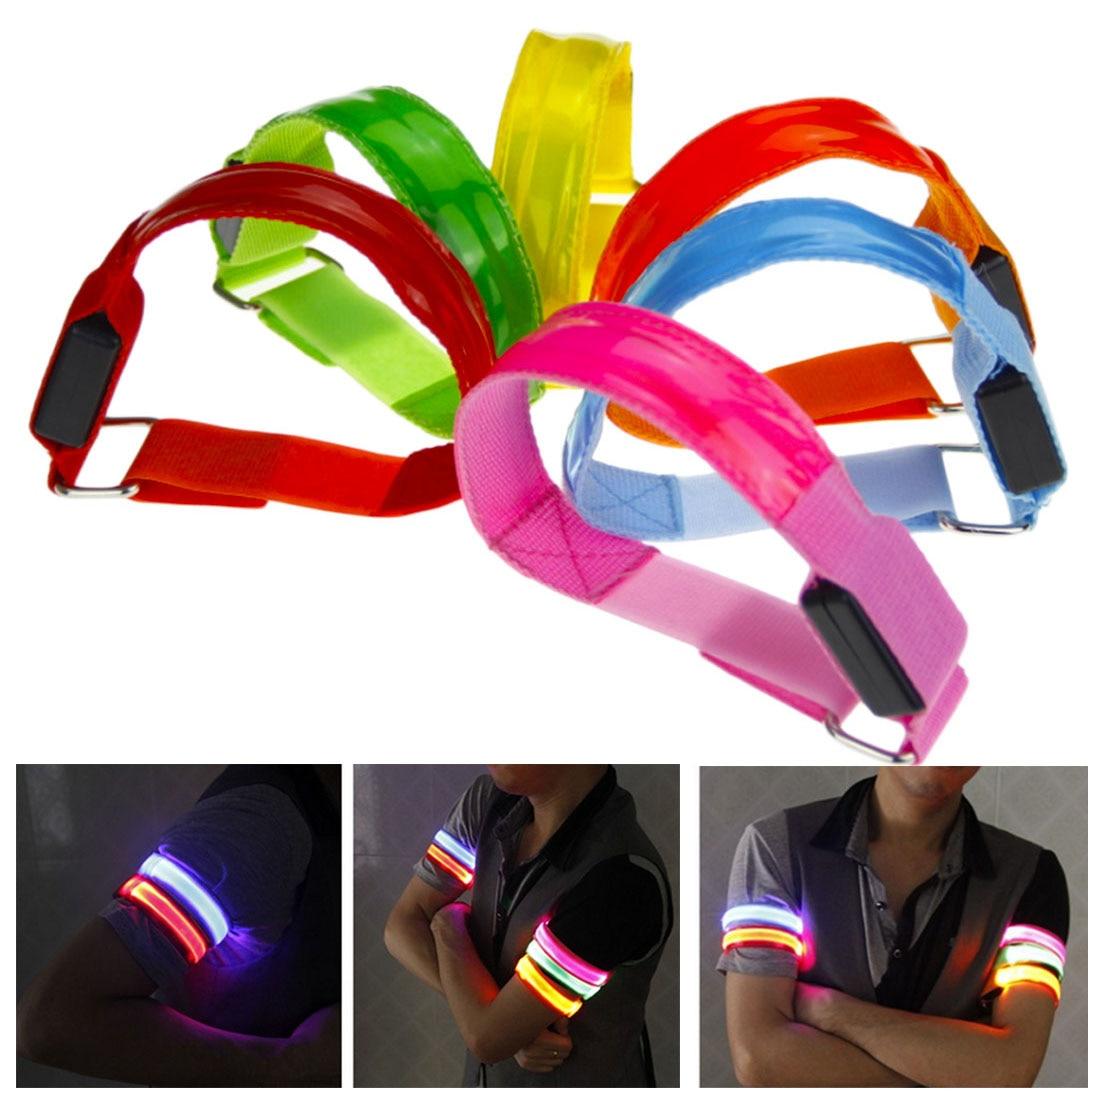 Arm Warmer Belt Bike LED Armband LED Safety Sports Reflective Belt Strap Snap Wrap Arm Band Armband Light